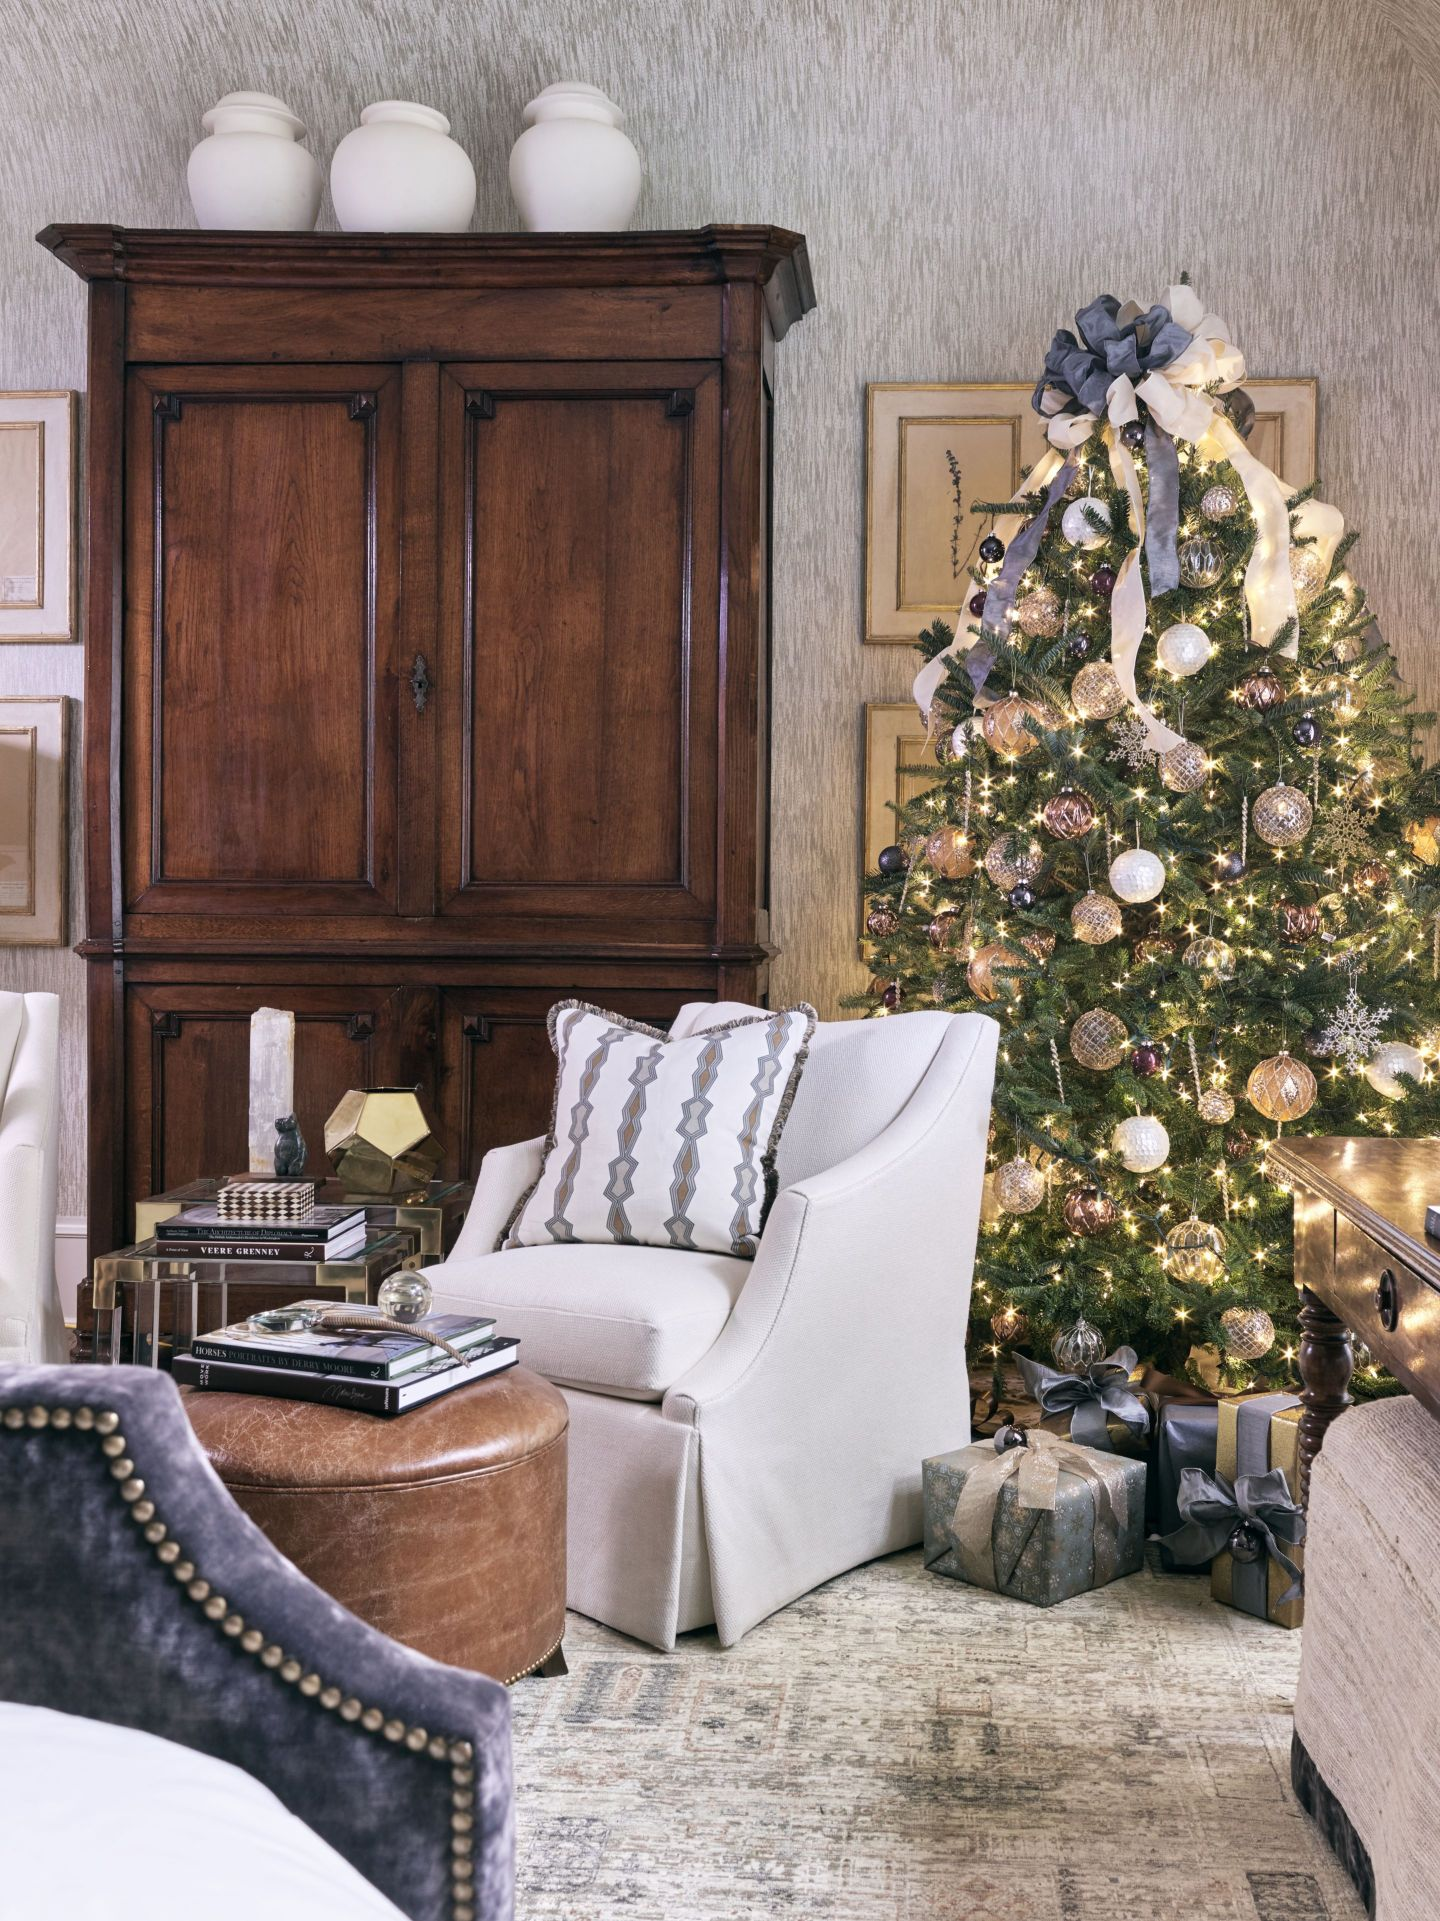 AHL_181113_showhouse32072_Jessica-Bradley-Interiors Home for the Holidays 2018: Atlanta, GA Style